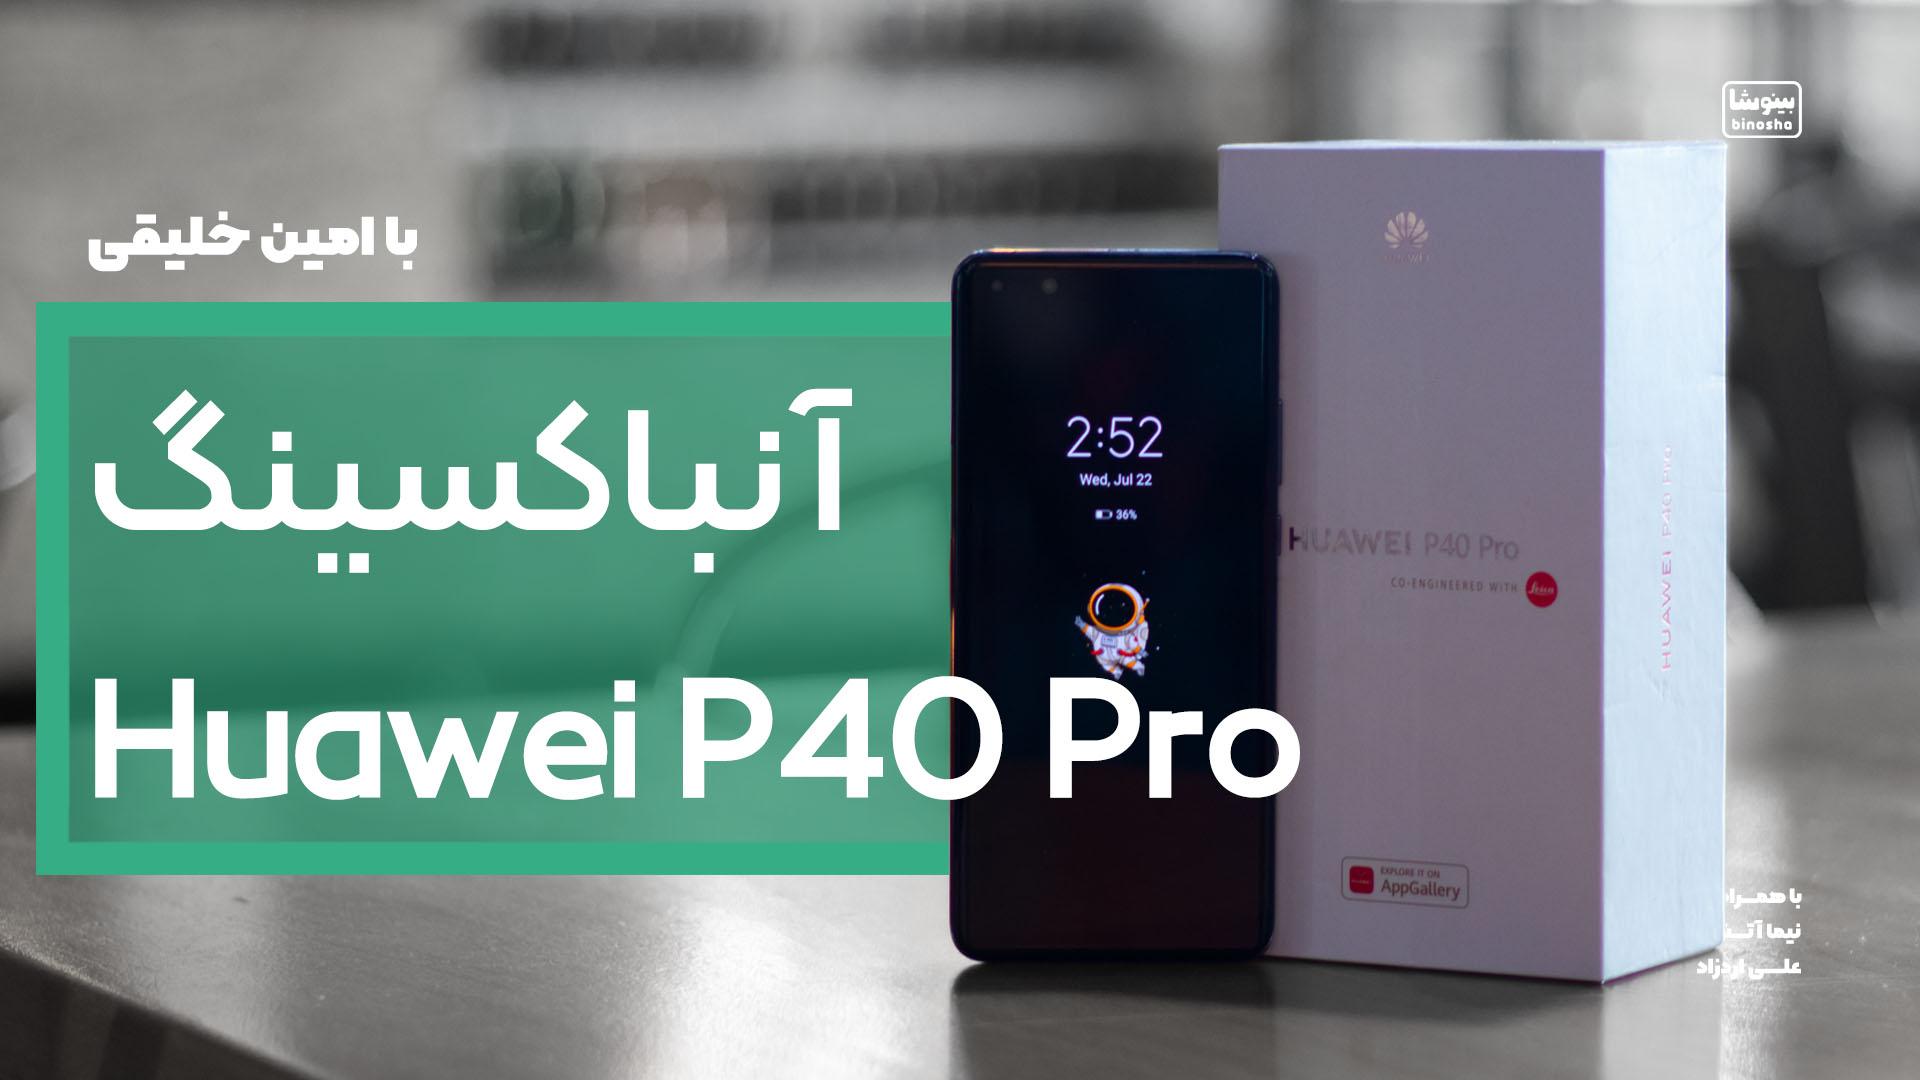 آنباکس جدیدترین گوشی پرچمدار هوآوی پی ۴۰ پرو | Huawei P40 Pro Unboxing